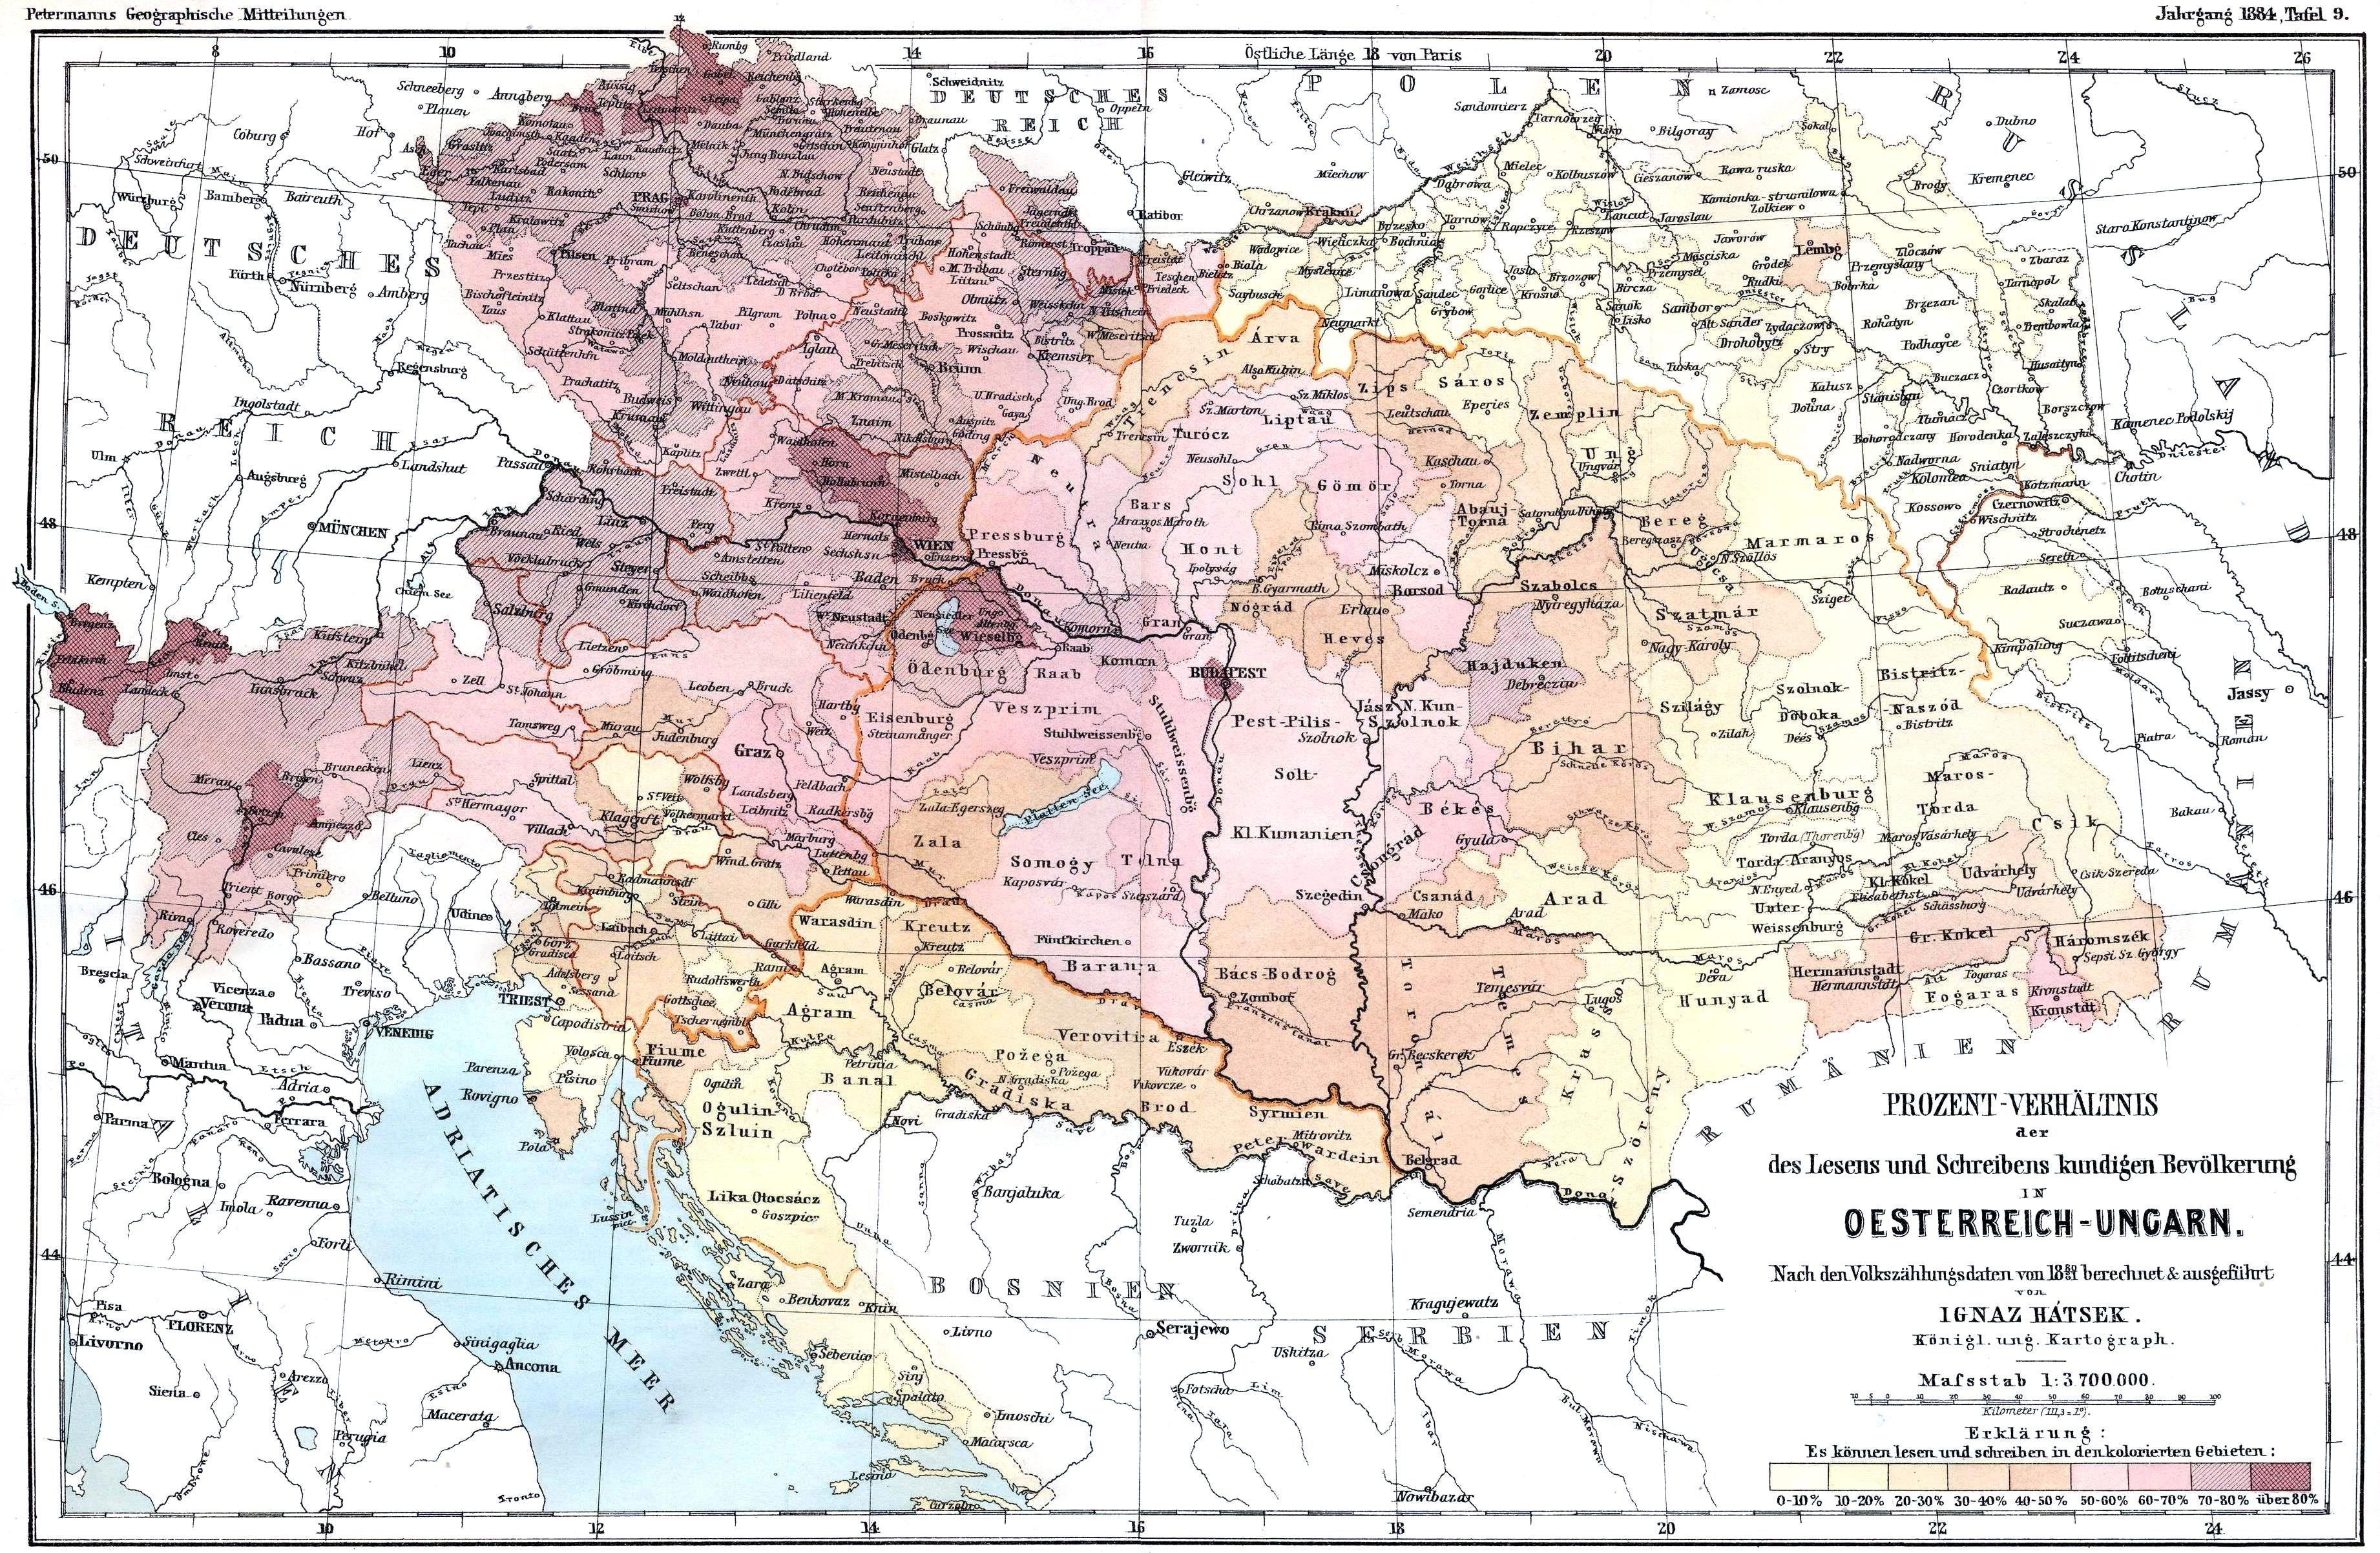 Literacy In AustriaHungary Census  WW  Pinterest - Railway map usa 1890